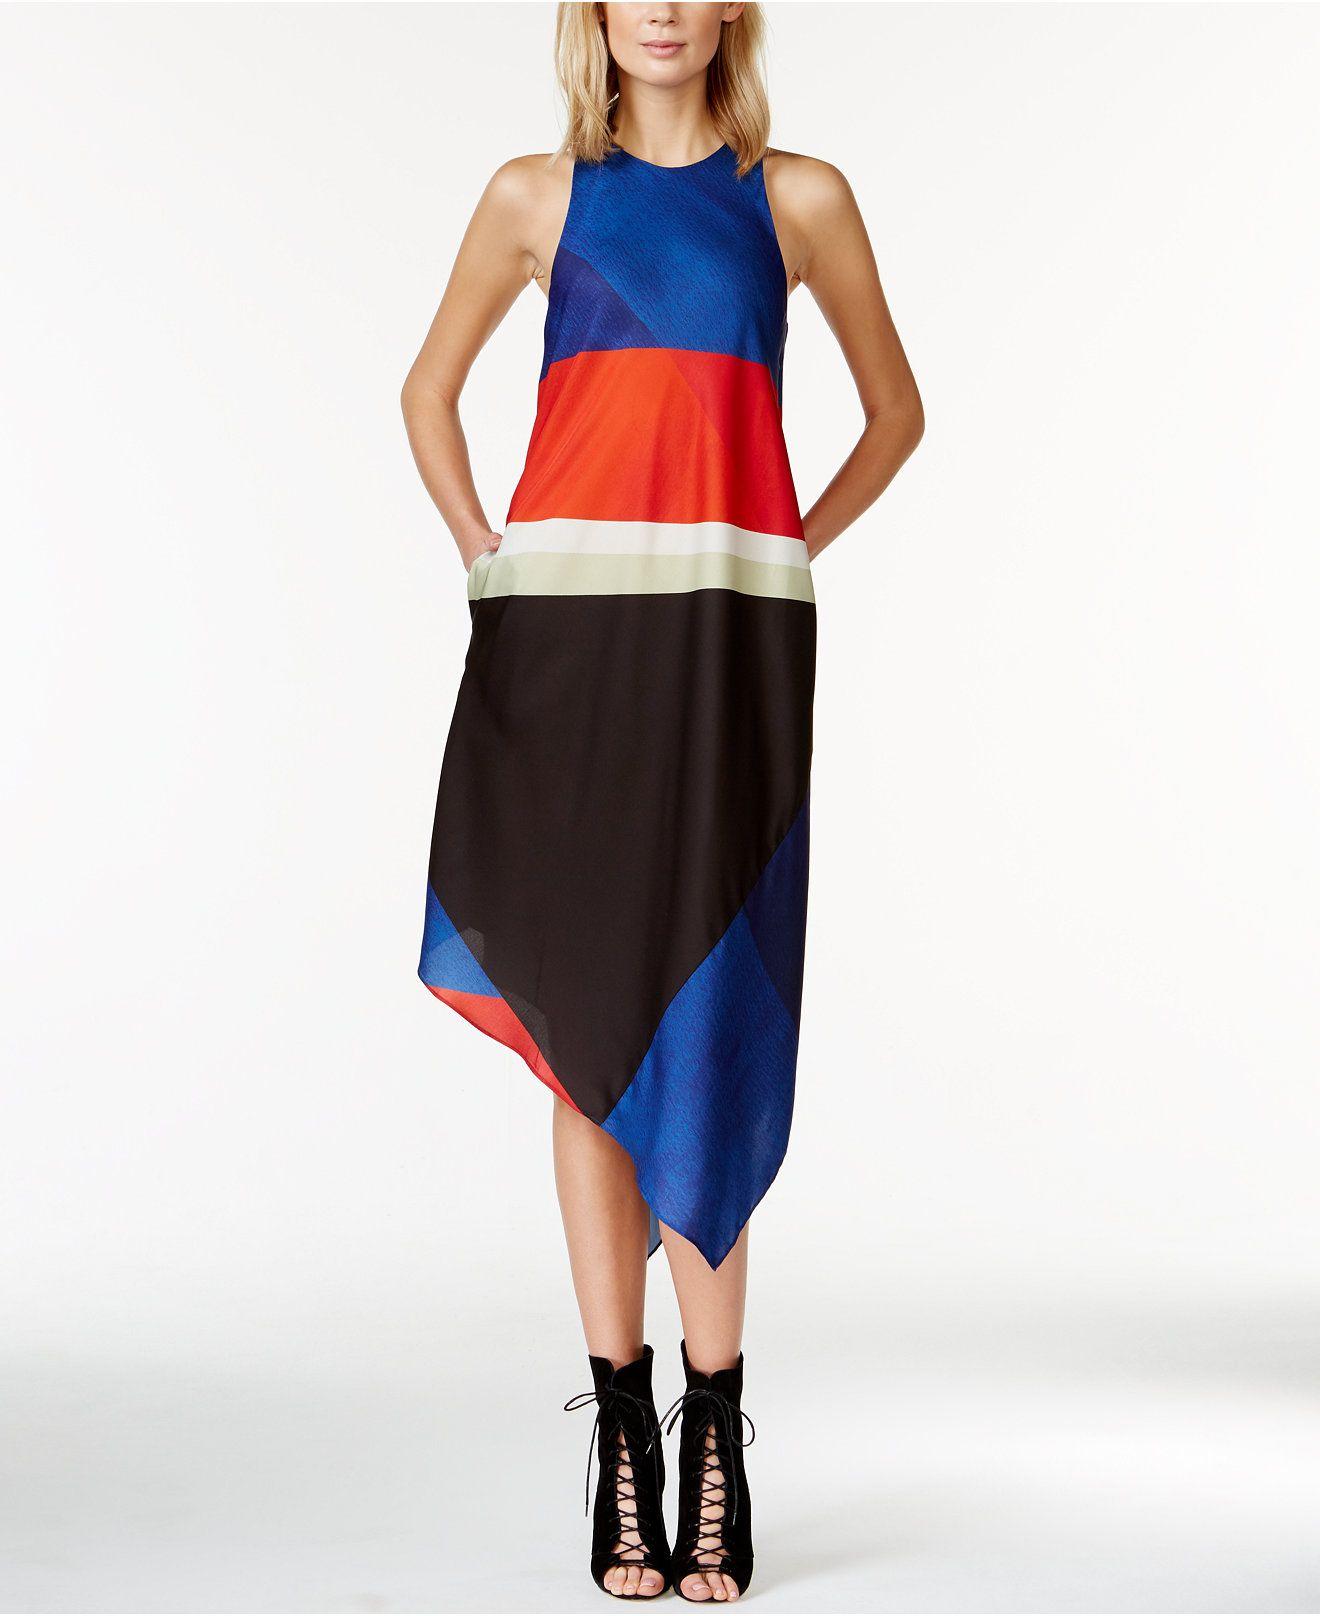 c00f19e09b9  119 RACHEL Rachel Roy Colorblocked Handkerchief Dress - Dresses - Women -  Macy s